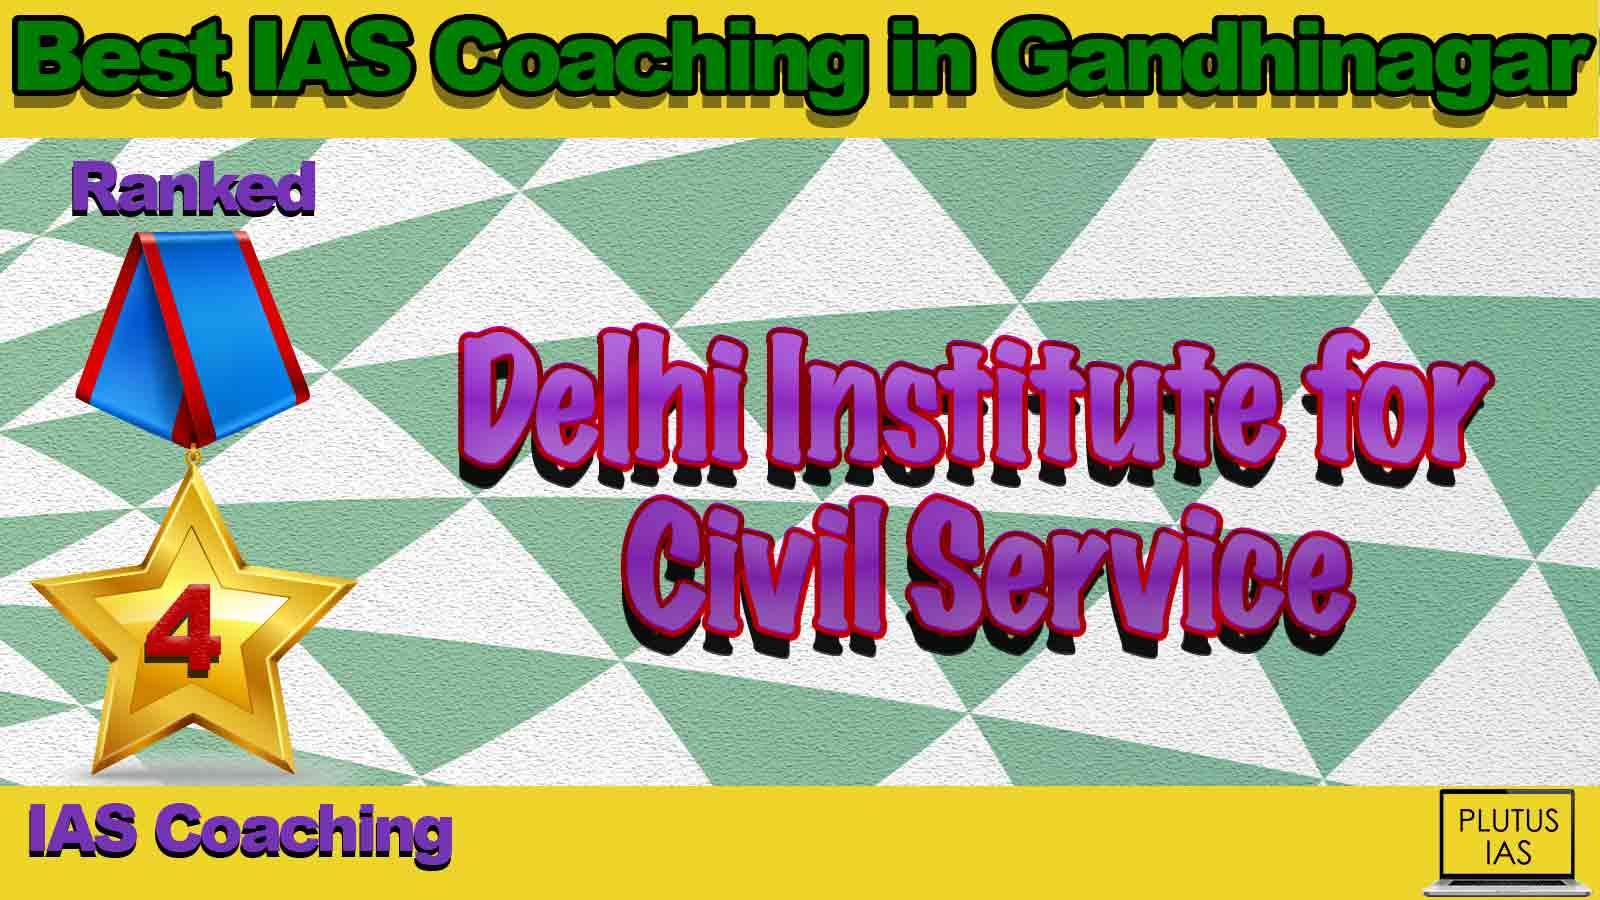 Top IAS Coaching in Gandhinagar